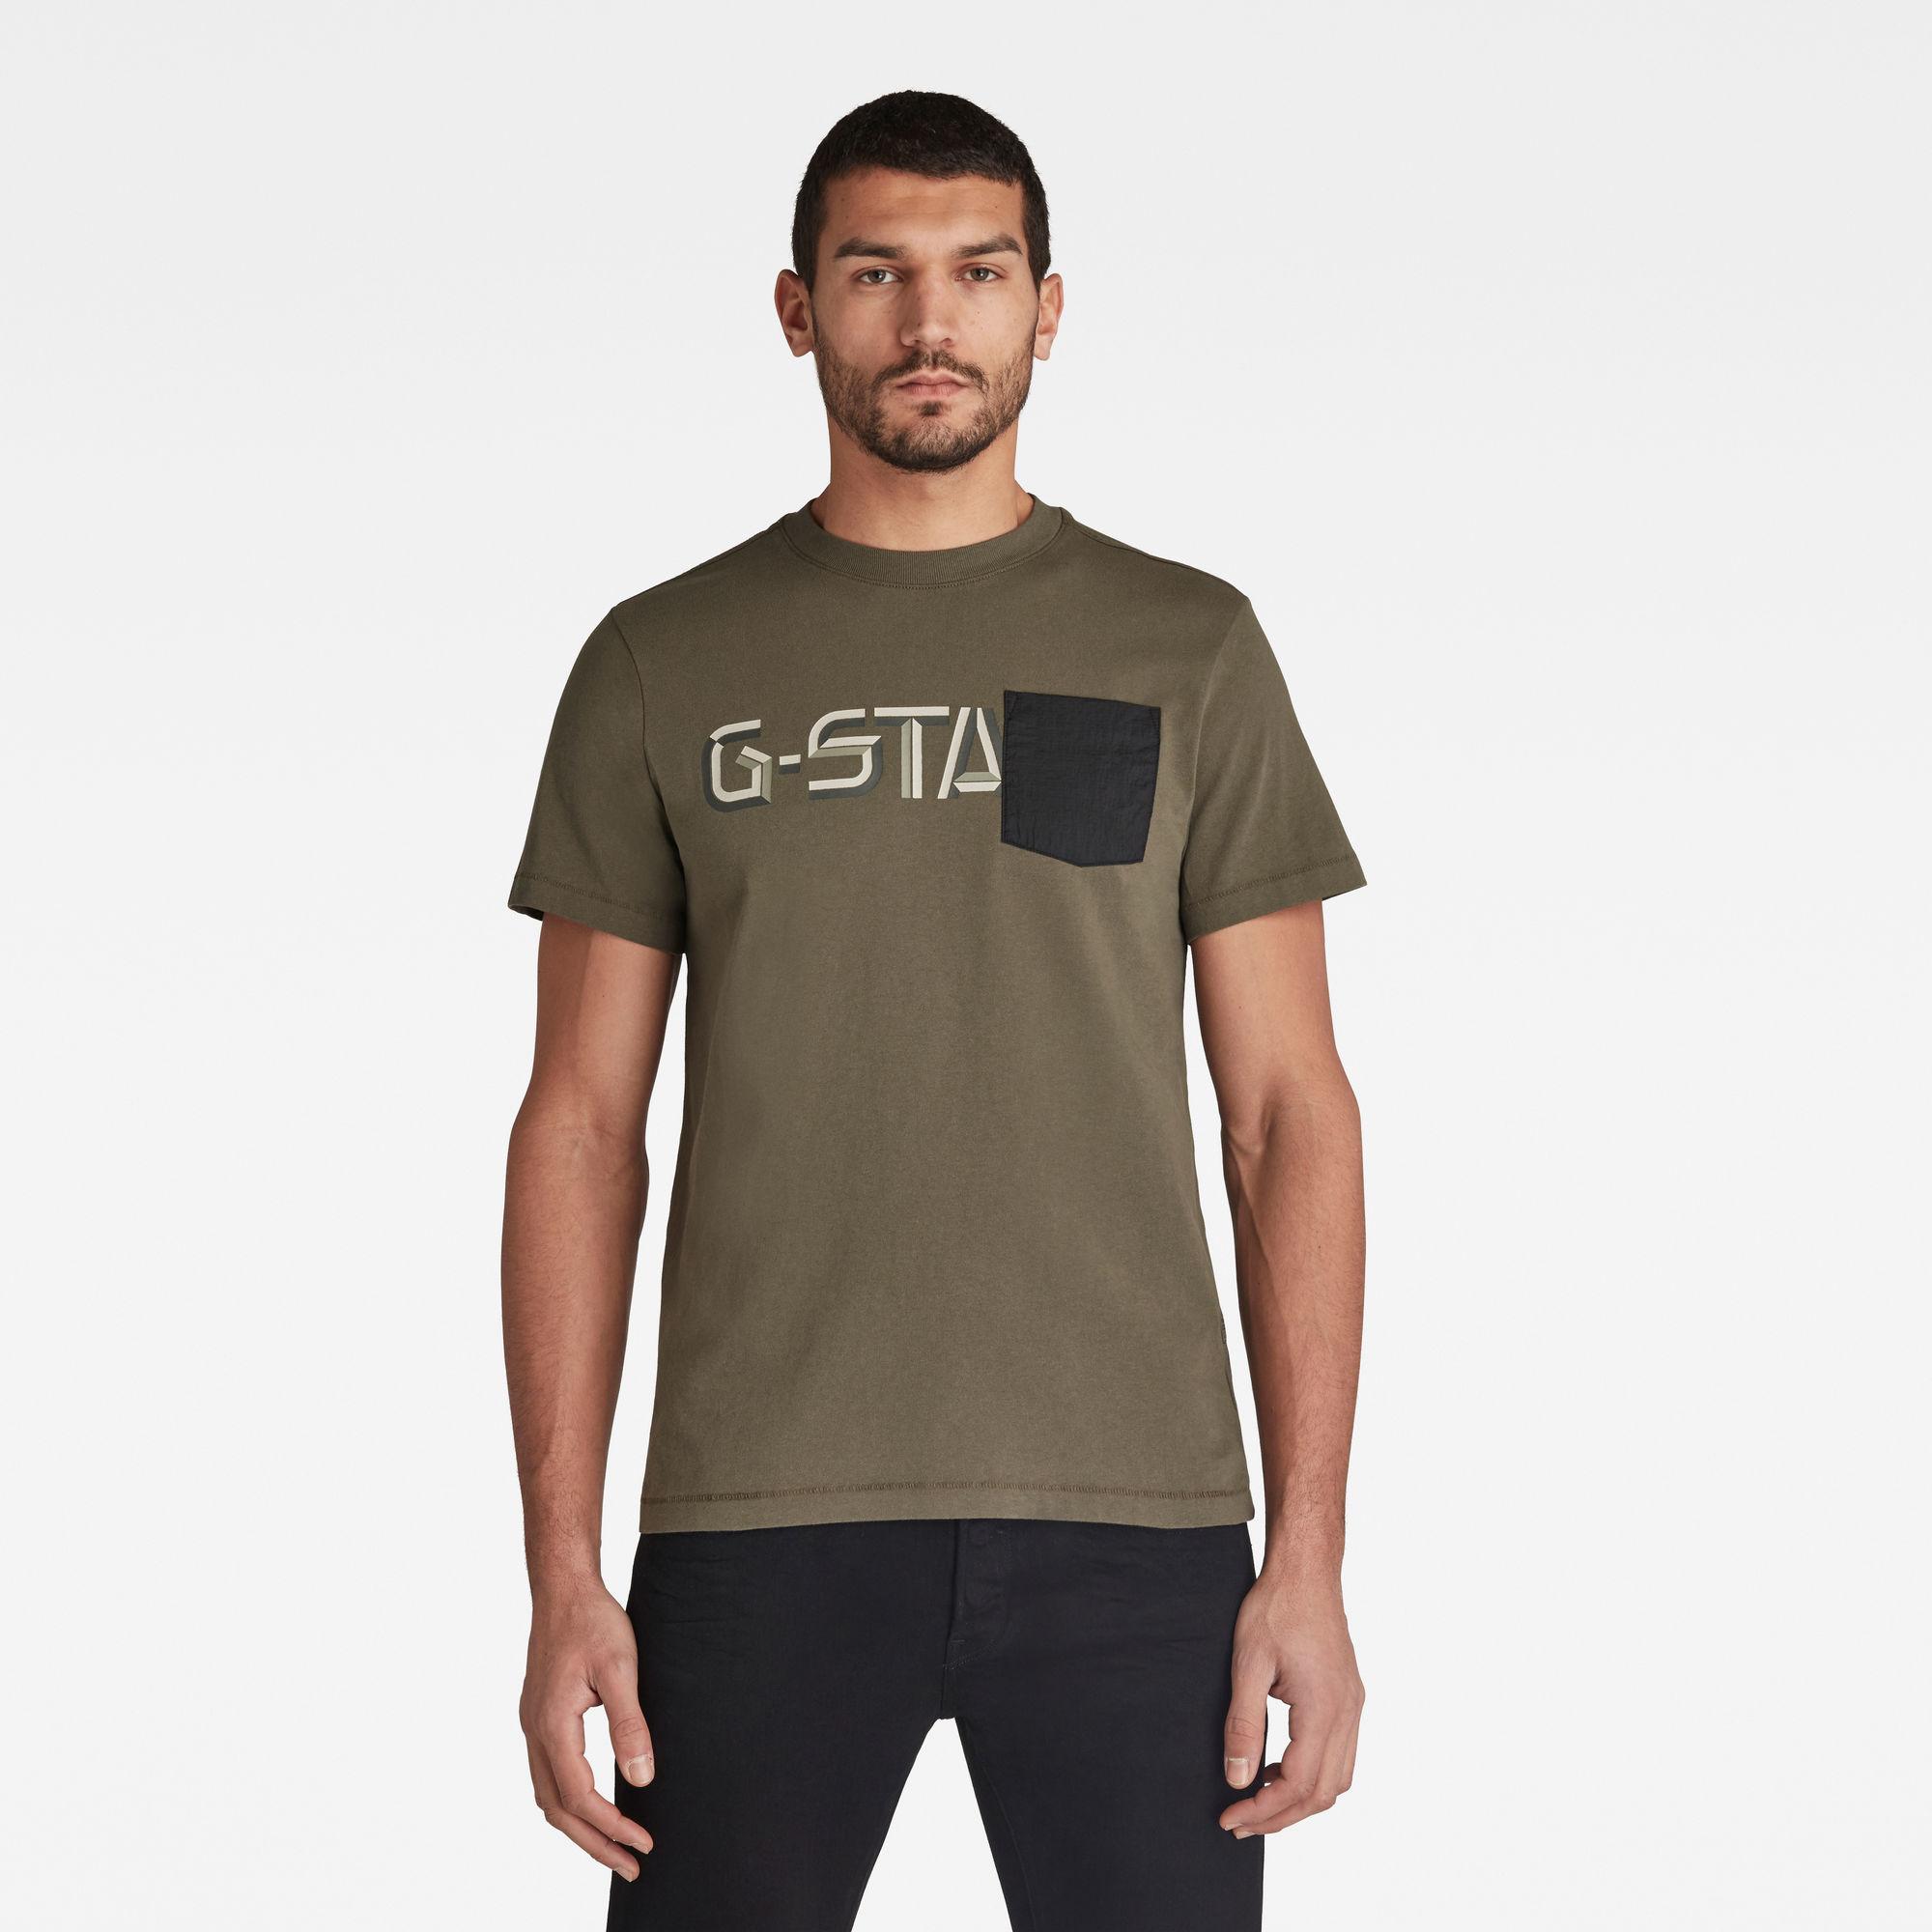 G-Star RAW Heren Ripstop Pocket Graphic T-Shirt Groen